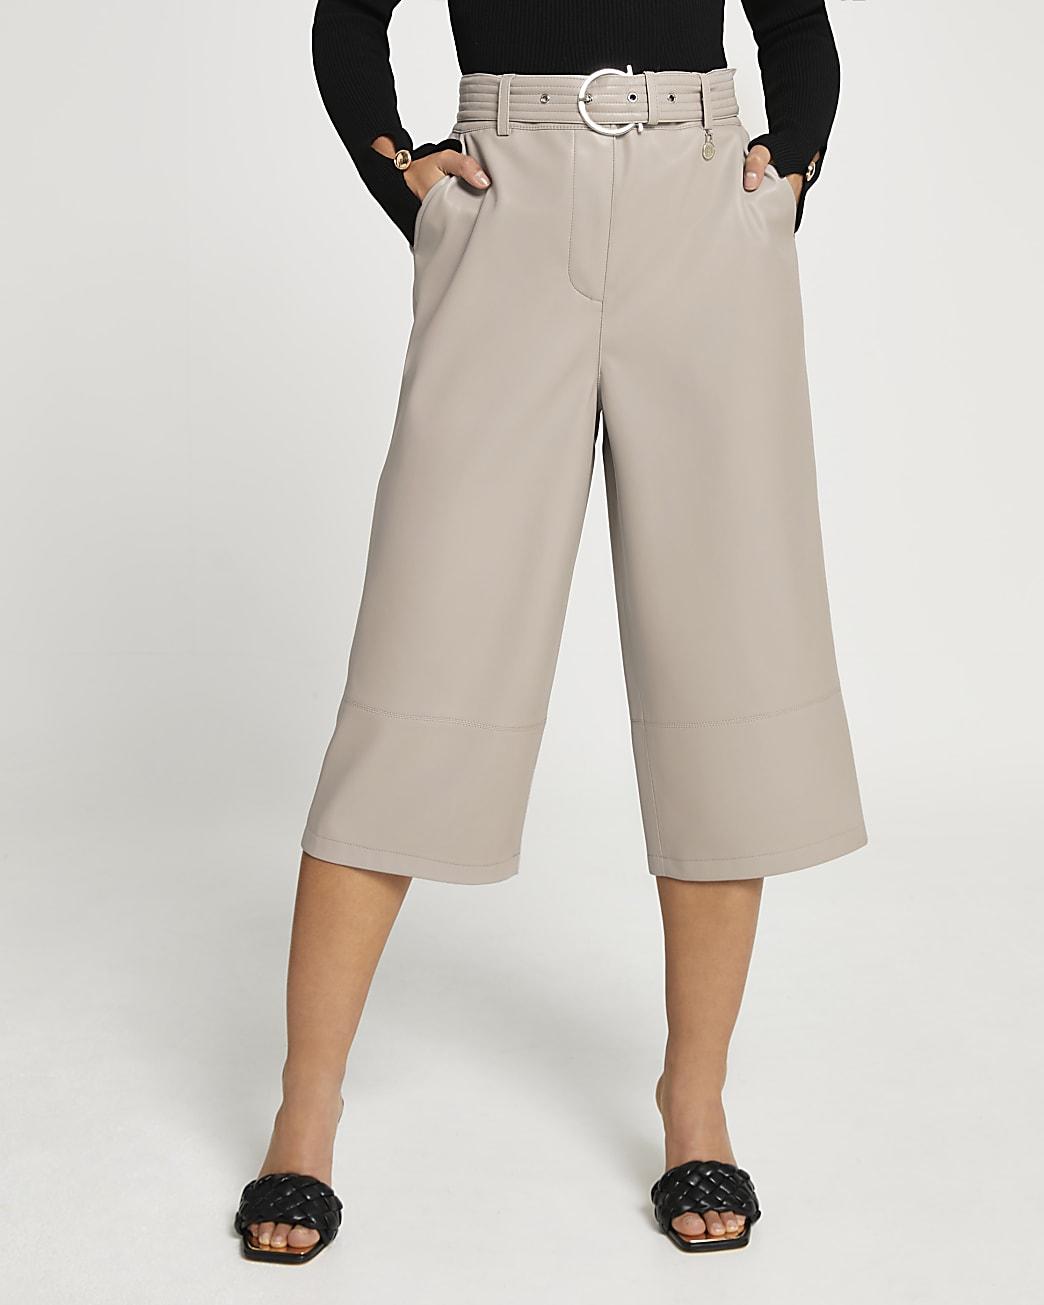 Petite grey faux leather wide leg culottes